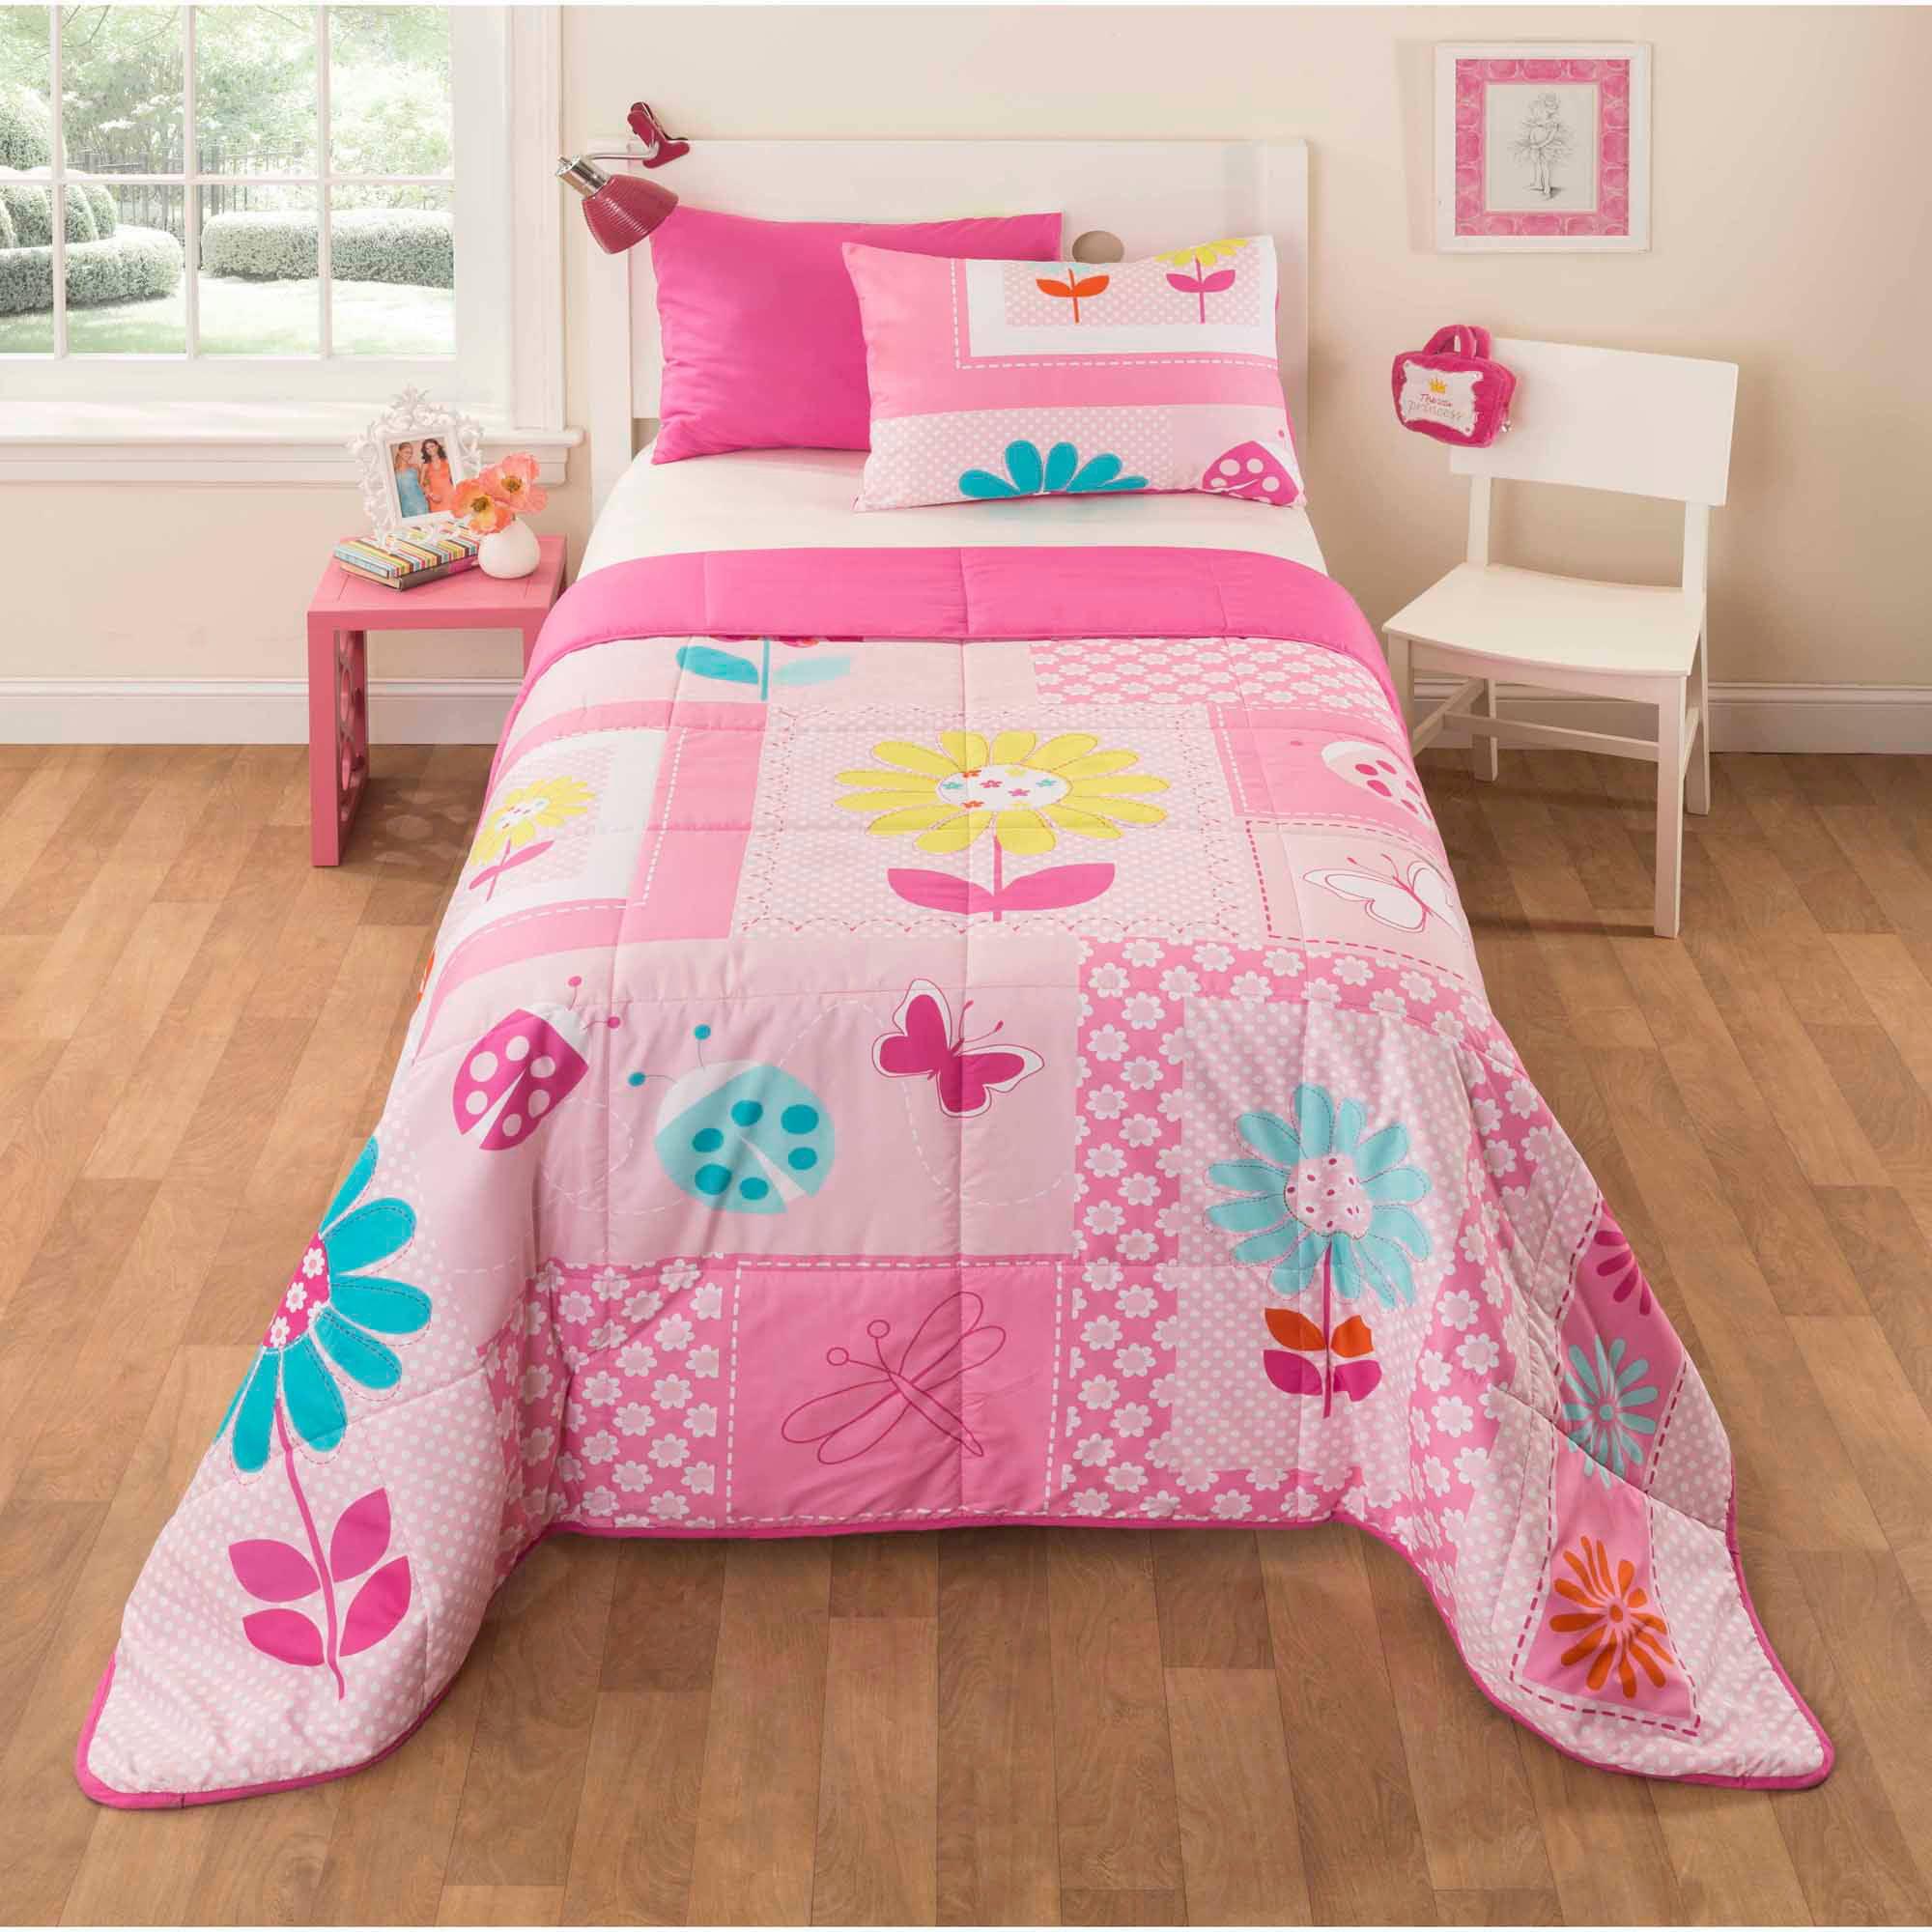 Idea Nuova Mainstays Kids Daisy Floral Bedding Comforter Set